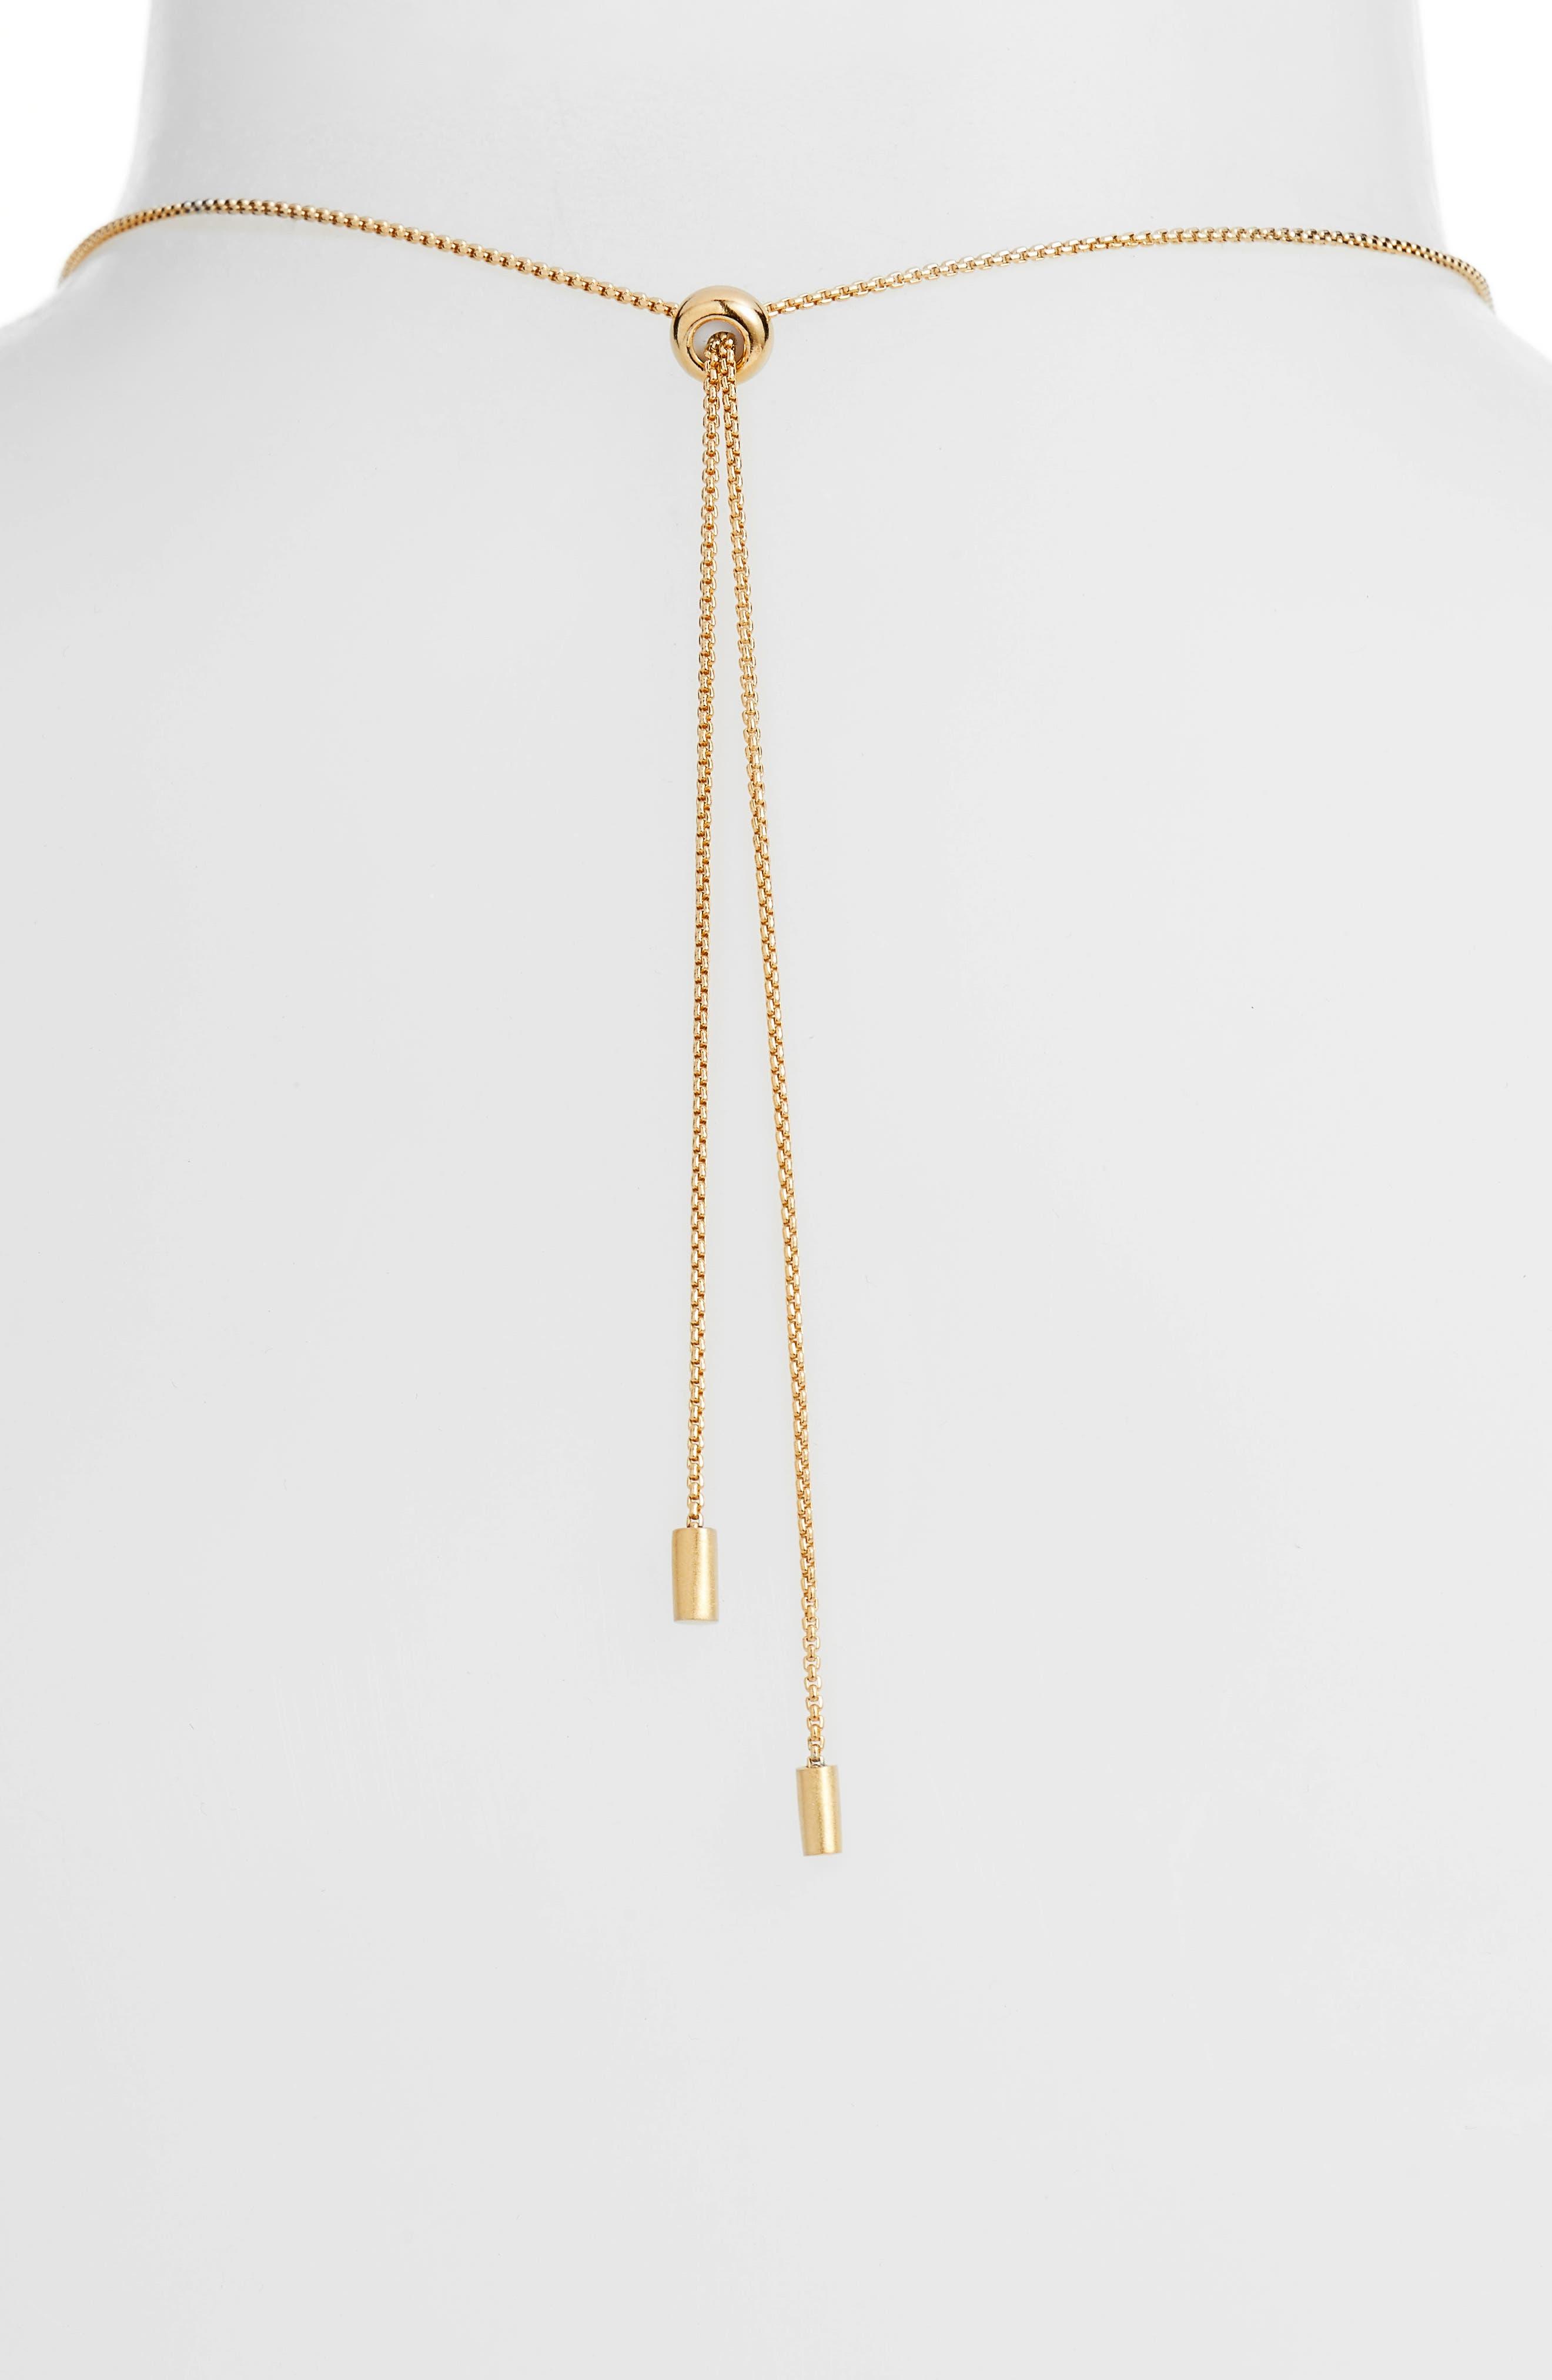 Taj Pendant Adjustable Necklace,                             Alternate thumbnail 3, color,                             Gold